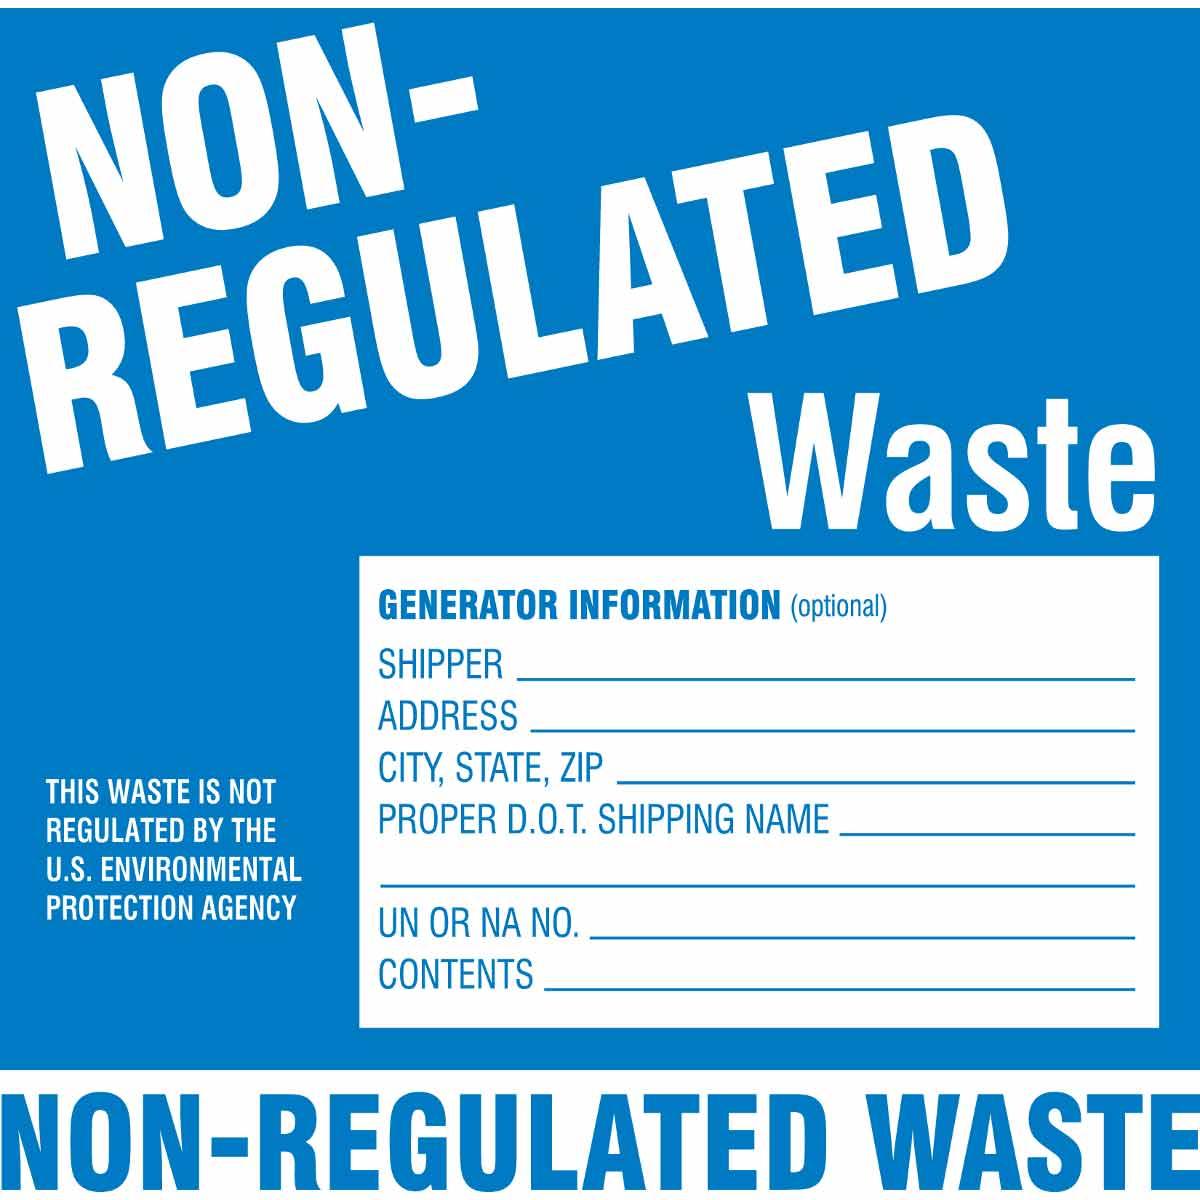 Brady® 121154 Non-Reflective Self-Adhesive Square Hazardous Waste Label, 6 in W, NON-HAZARDOUS WASTE...ETC OPTIONAL INFORMATION SHIPPER____, ADDRESS____, CONTENTS____ Legend, Green on White, B-7569 Adhesive Vinyl Film, 100 per Pack Labels